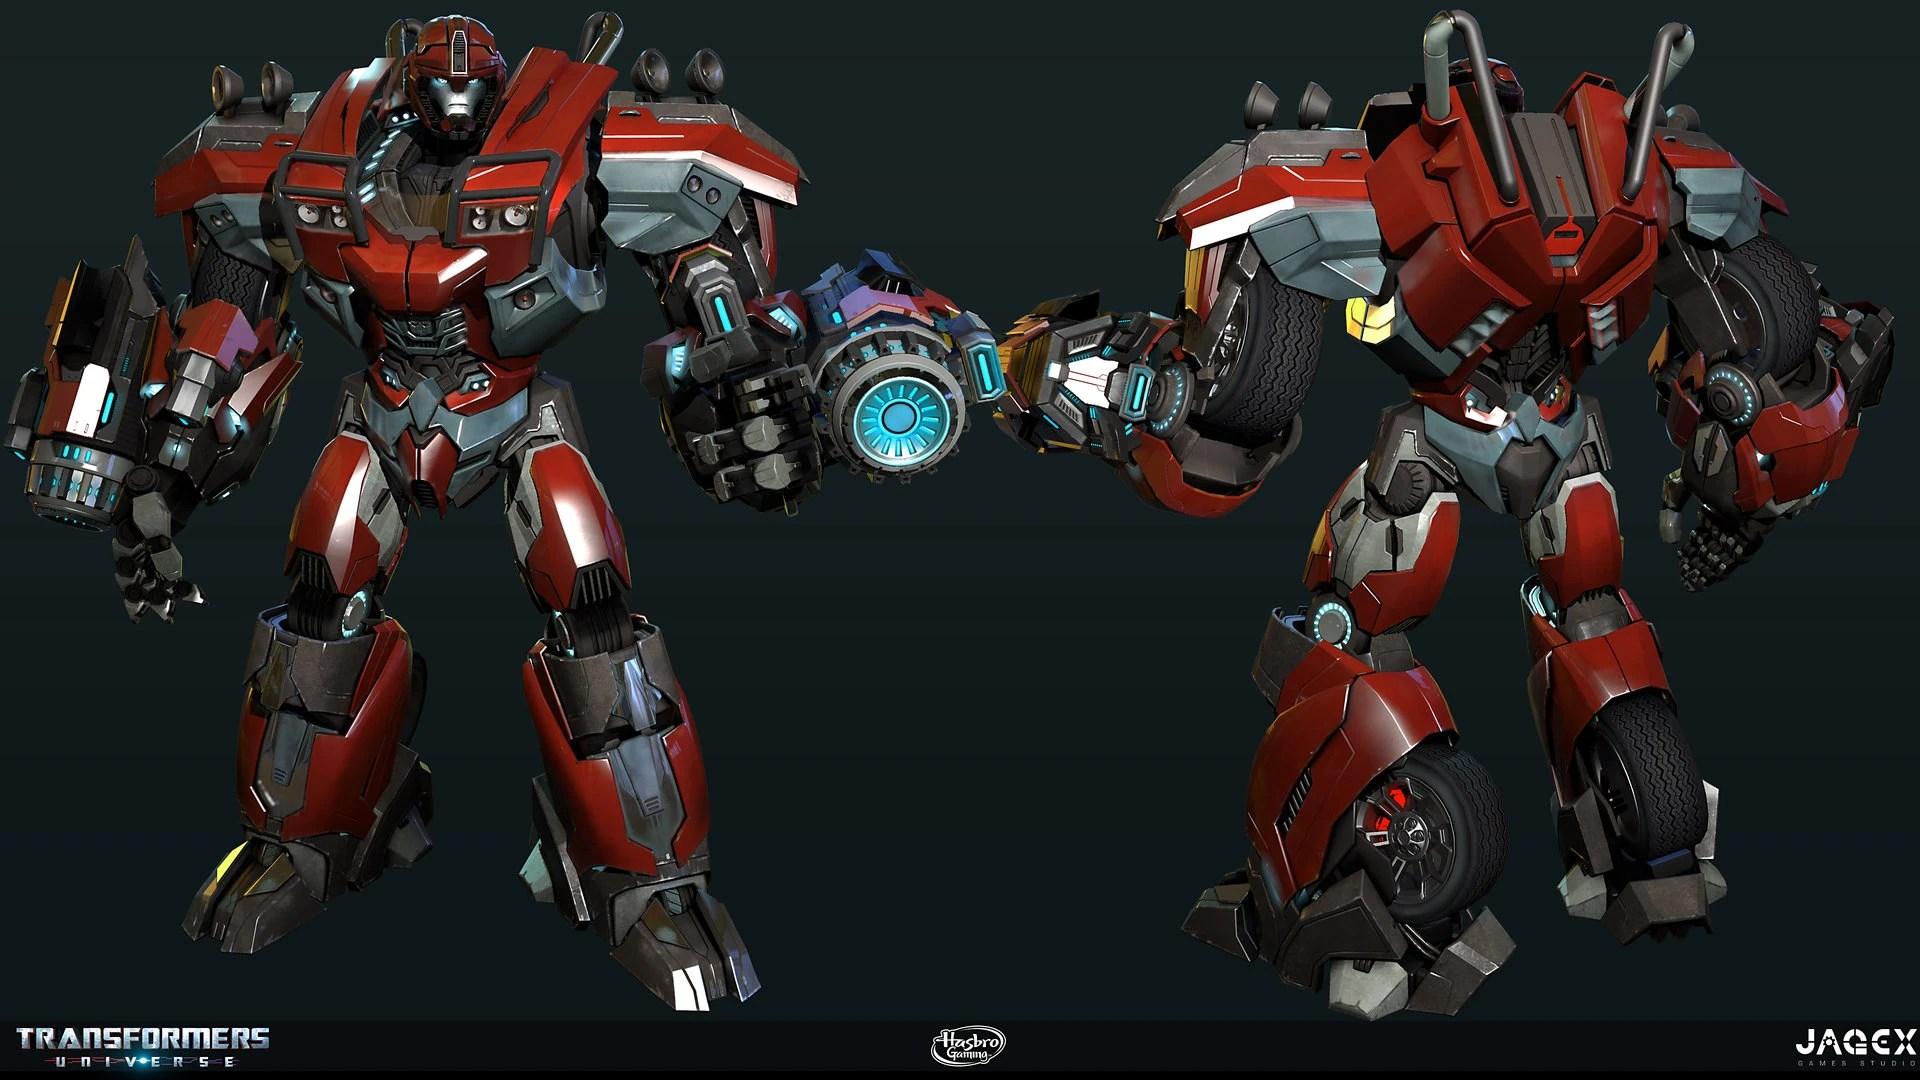 Grimlock Fall Of Cybertron Wallpaper Ironhide Transformers Universe Wiki Fandom Powered By